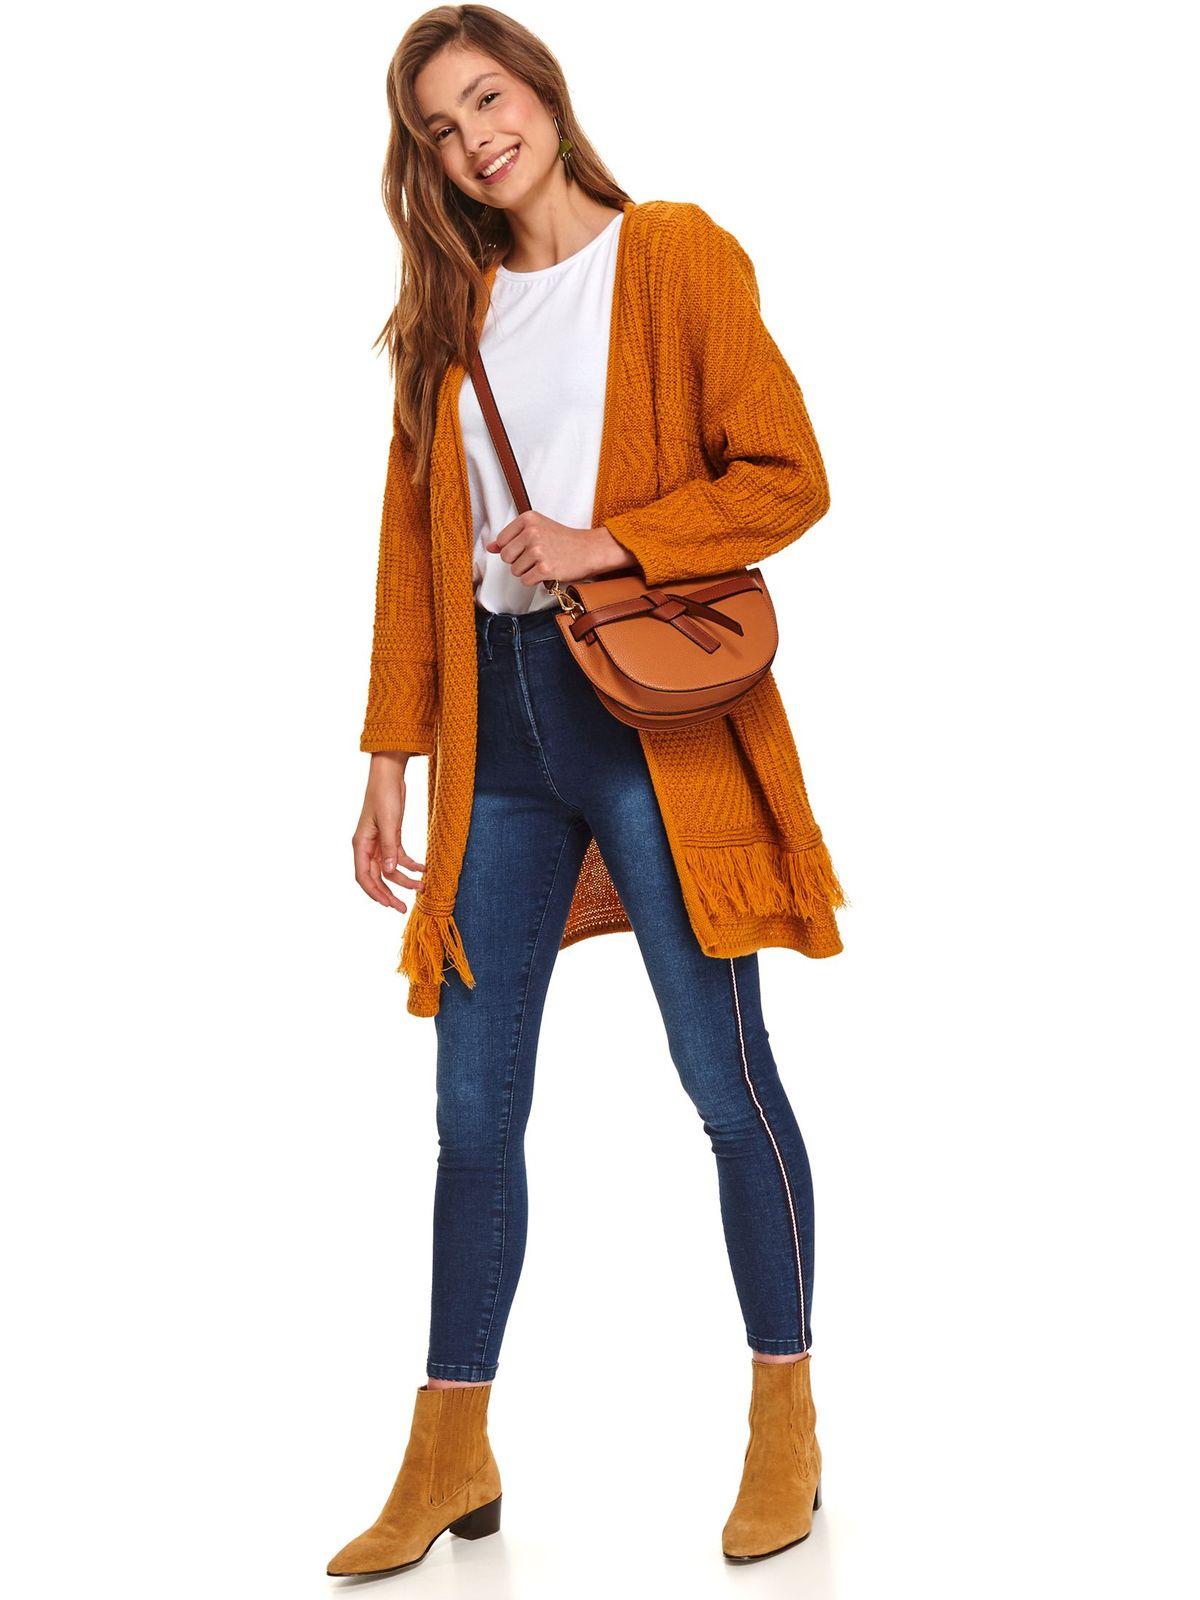 Blue trousers casual skinny jeans medium waist slightly elastic cotton